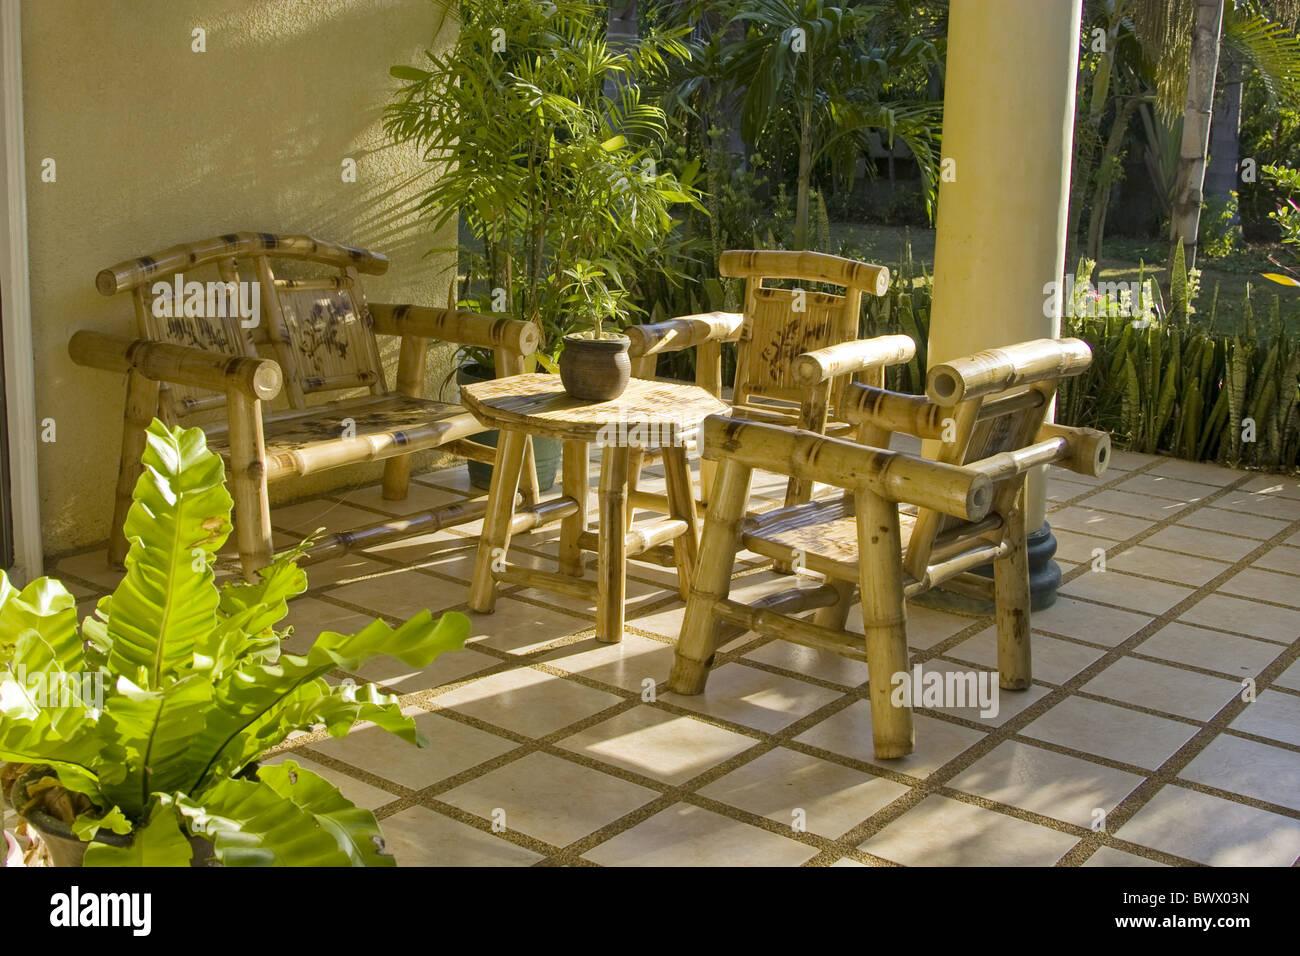 Gartenmöbel Aus Bambus Safari Paravent Aus Bambus 120 X 180 Cm Butlers